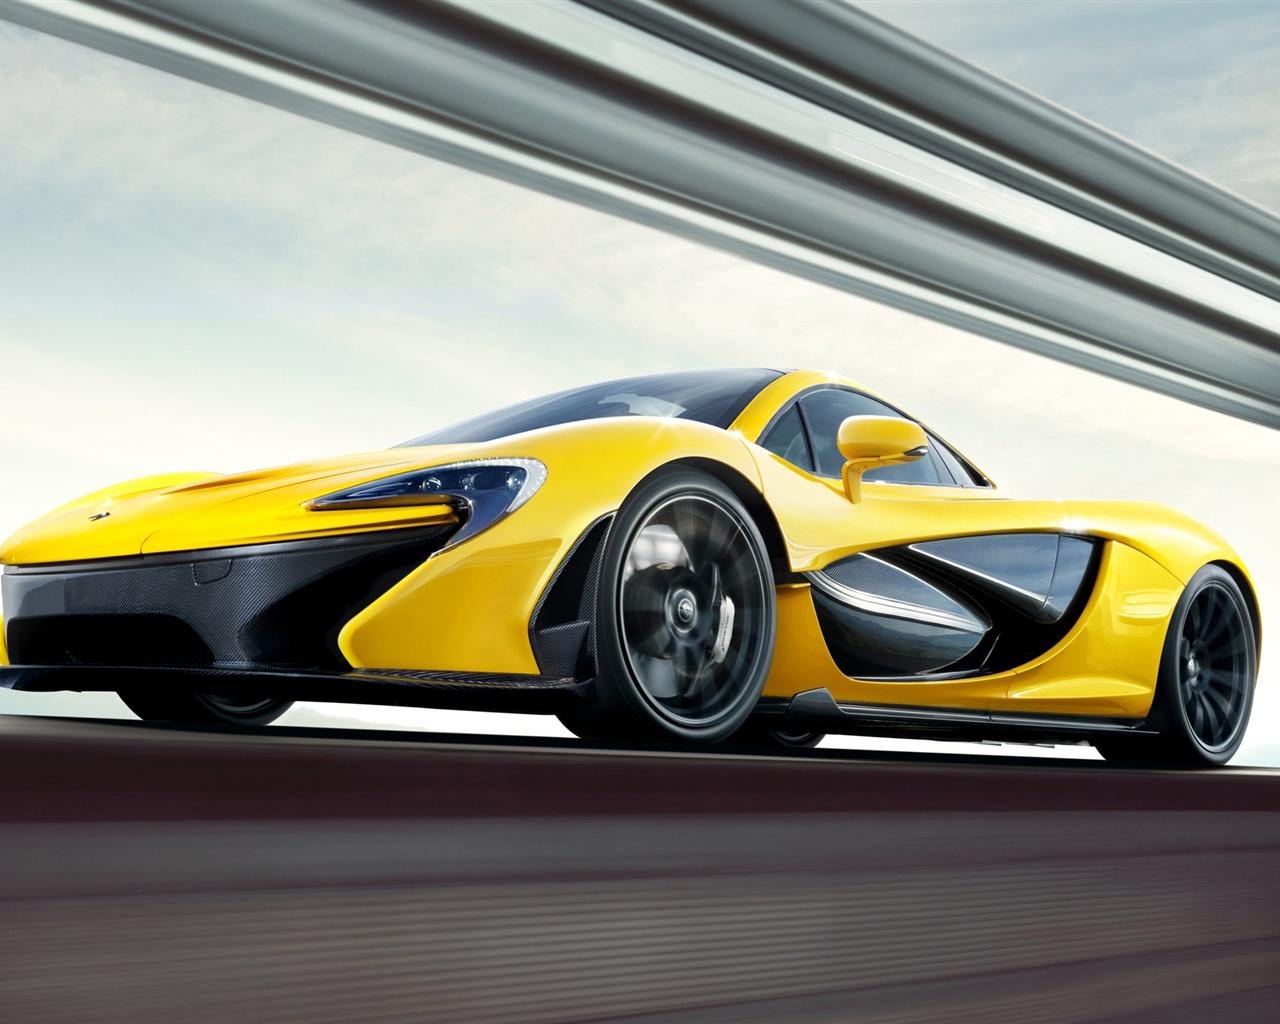 2013 McLaren P1 gelbe supercar Hintergrundbilder | 1280x1024 ...